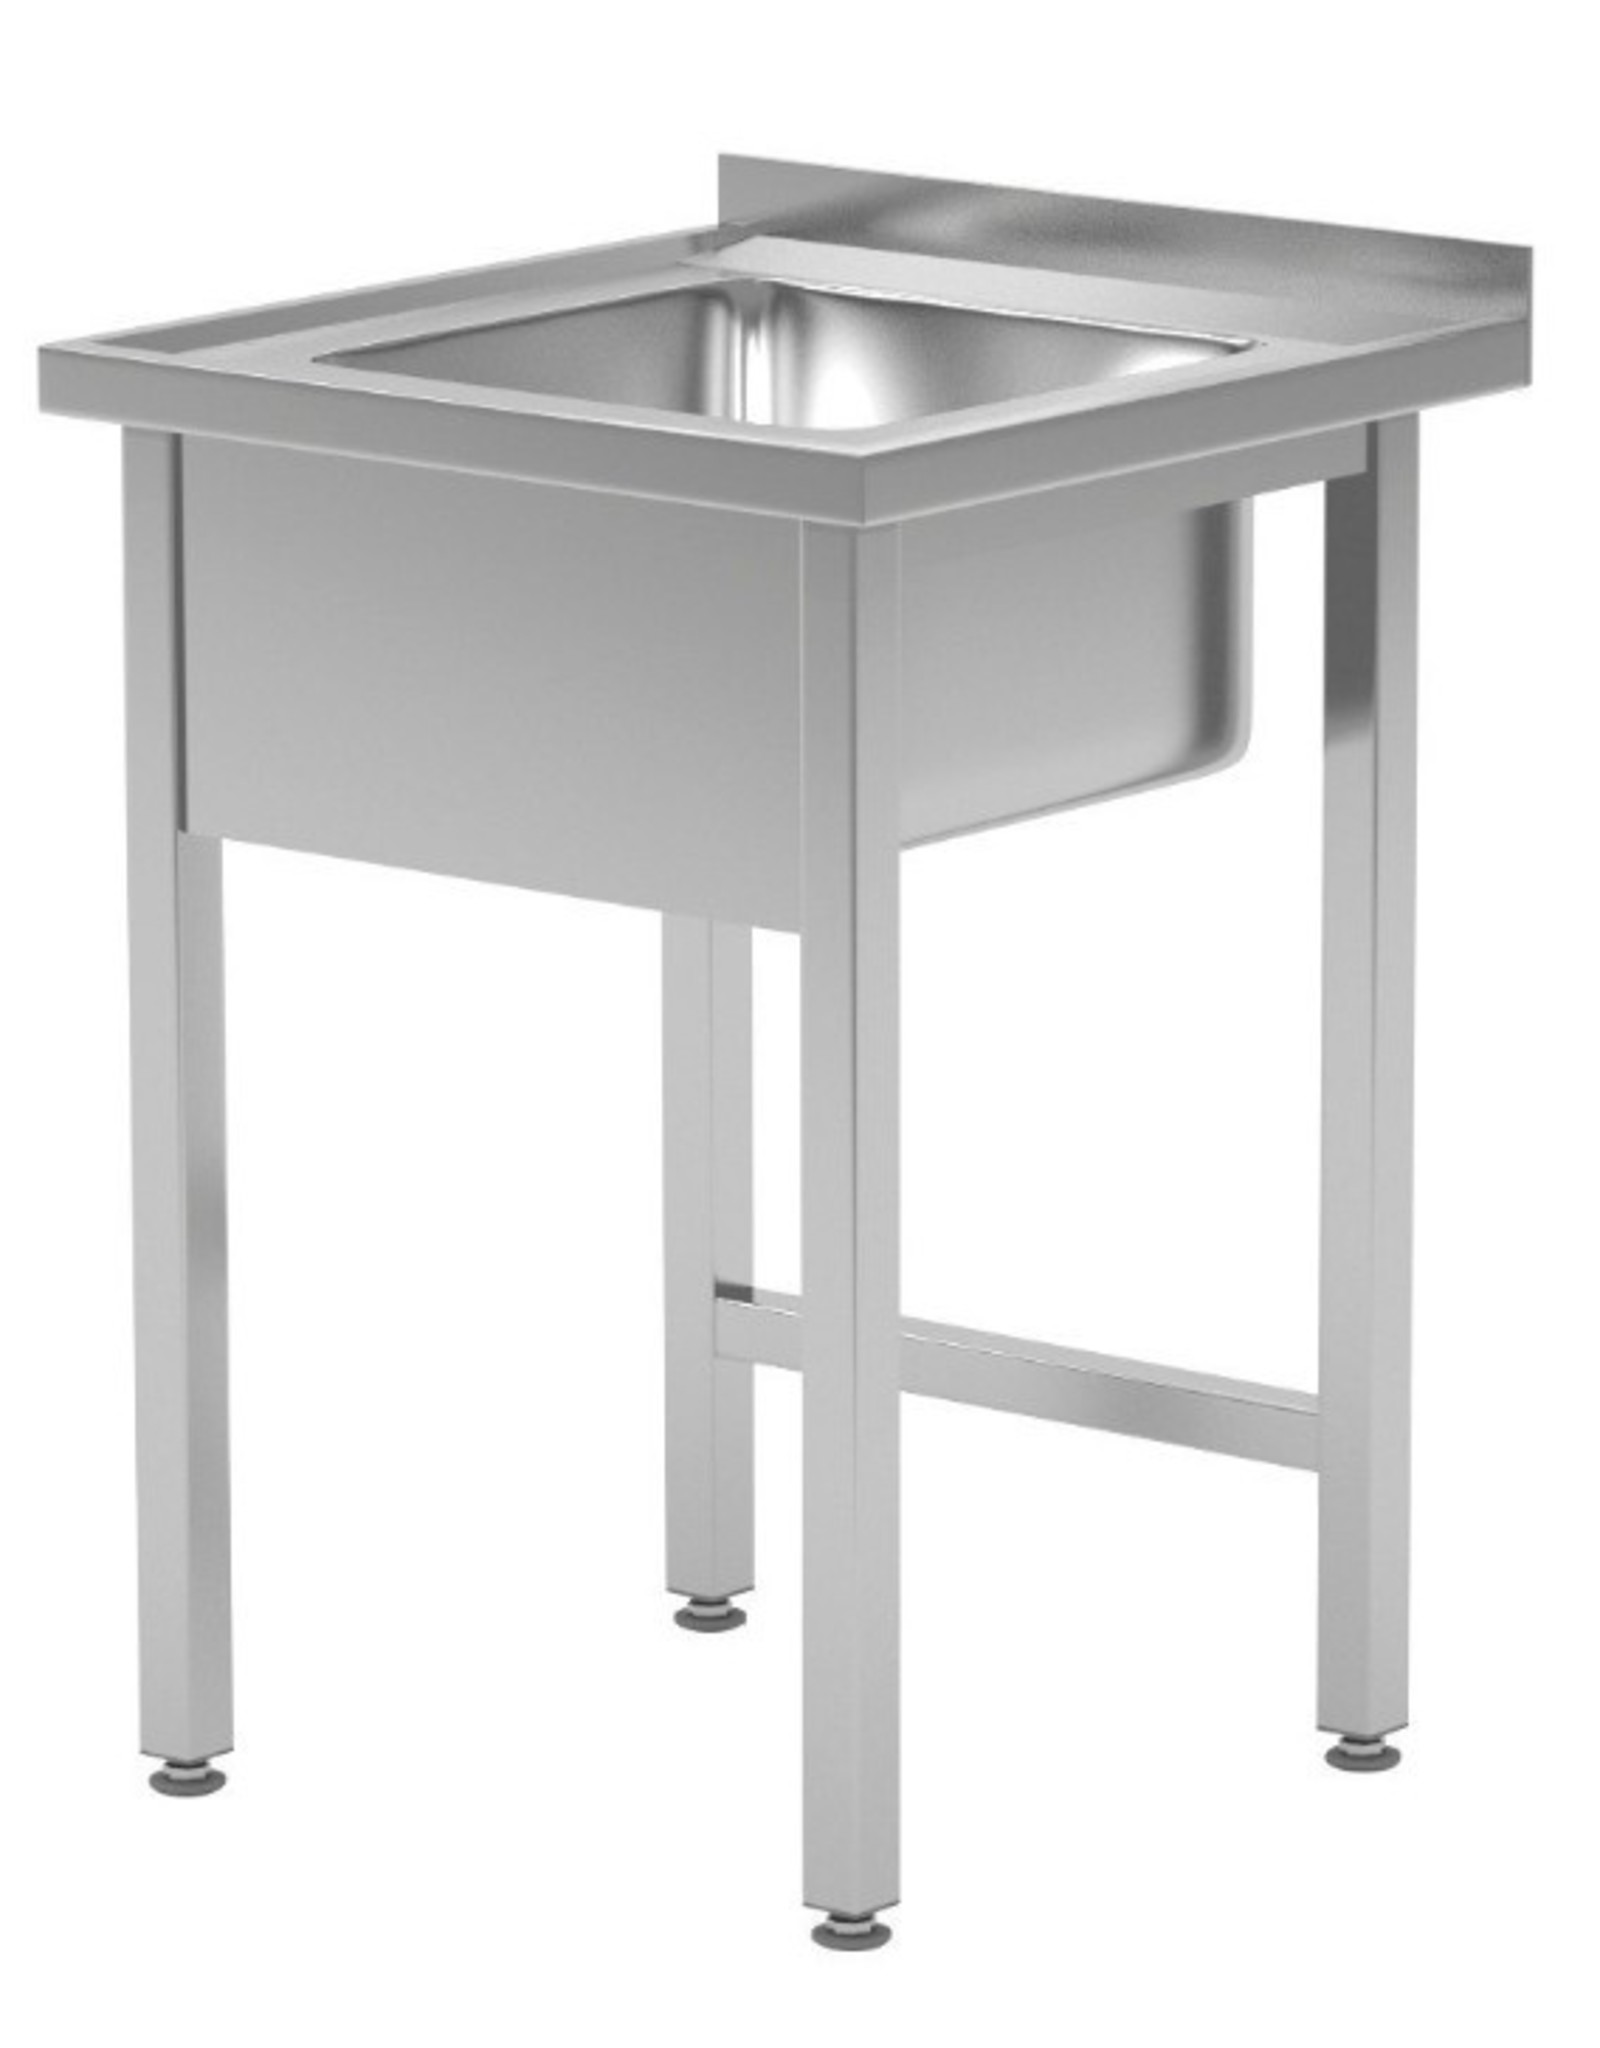 Spoeltafel   open onderkant   600-700mm breed   600 of 700mm diep